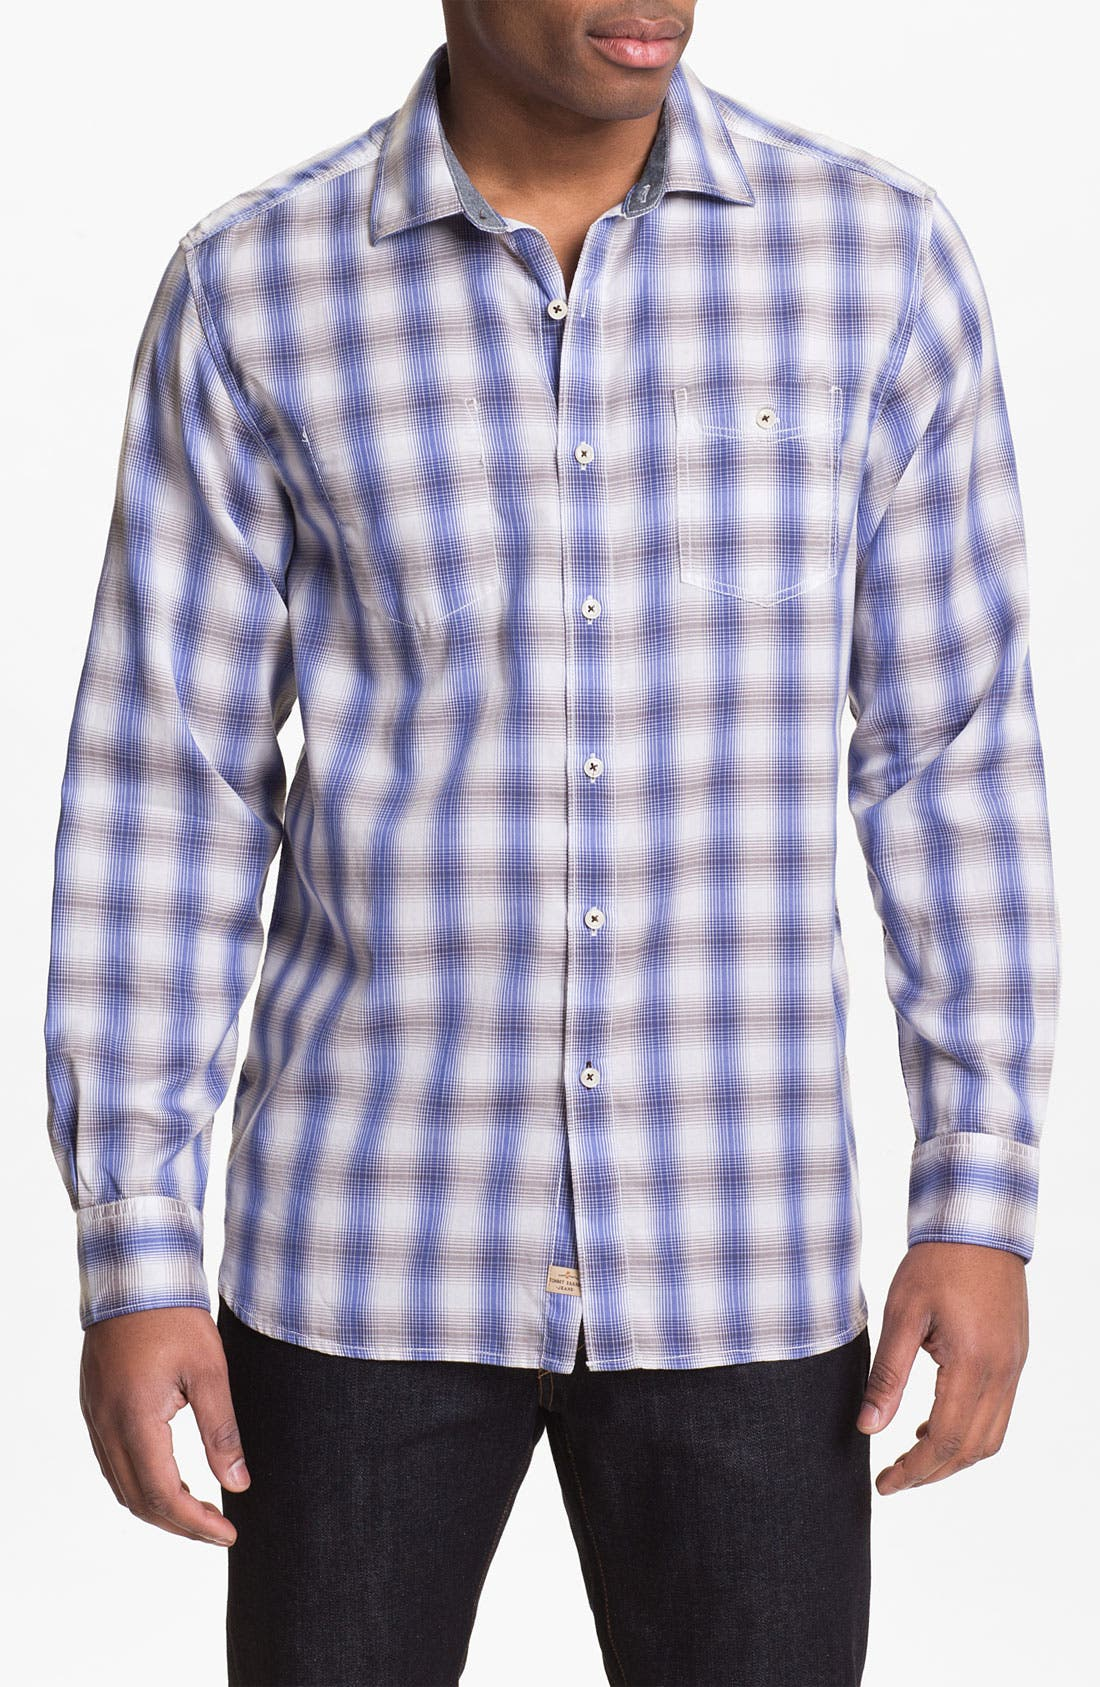 Main Image - Tommy Bahama 'San Pancho Plaid' Island Modern Fit Sport Shirt